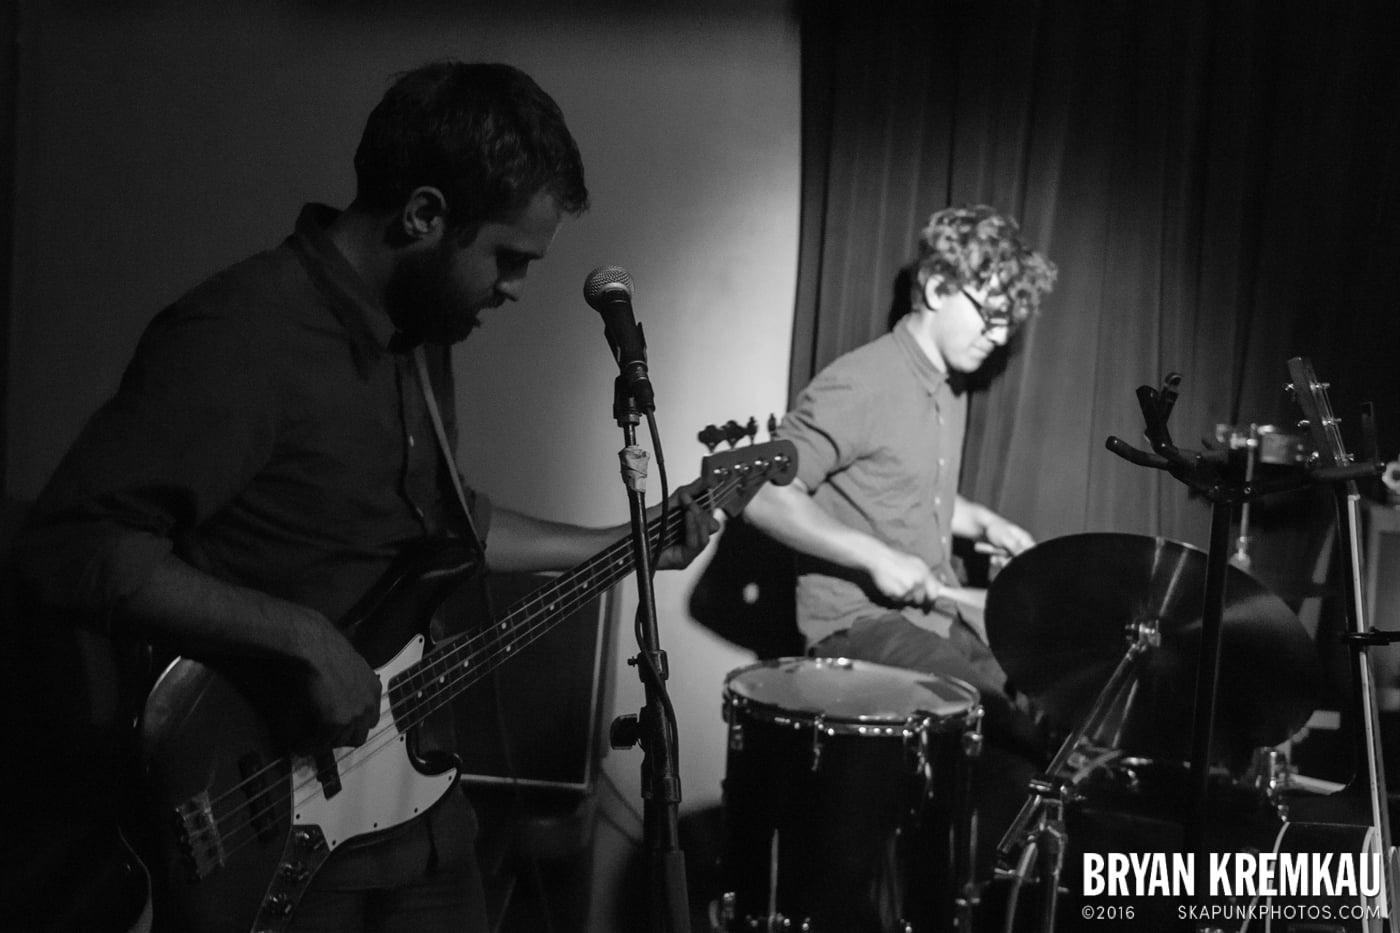 Jordan Klassen @ Bowery Electric, NYC - 10.9.13 (3)